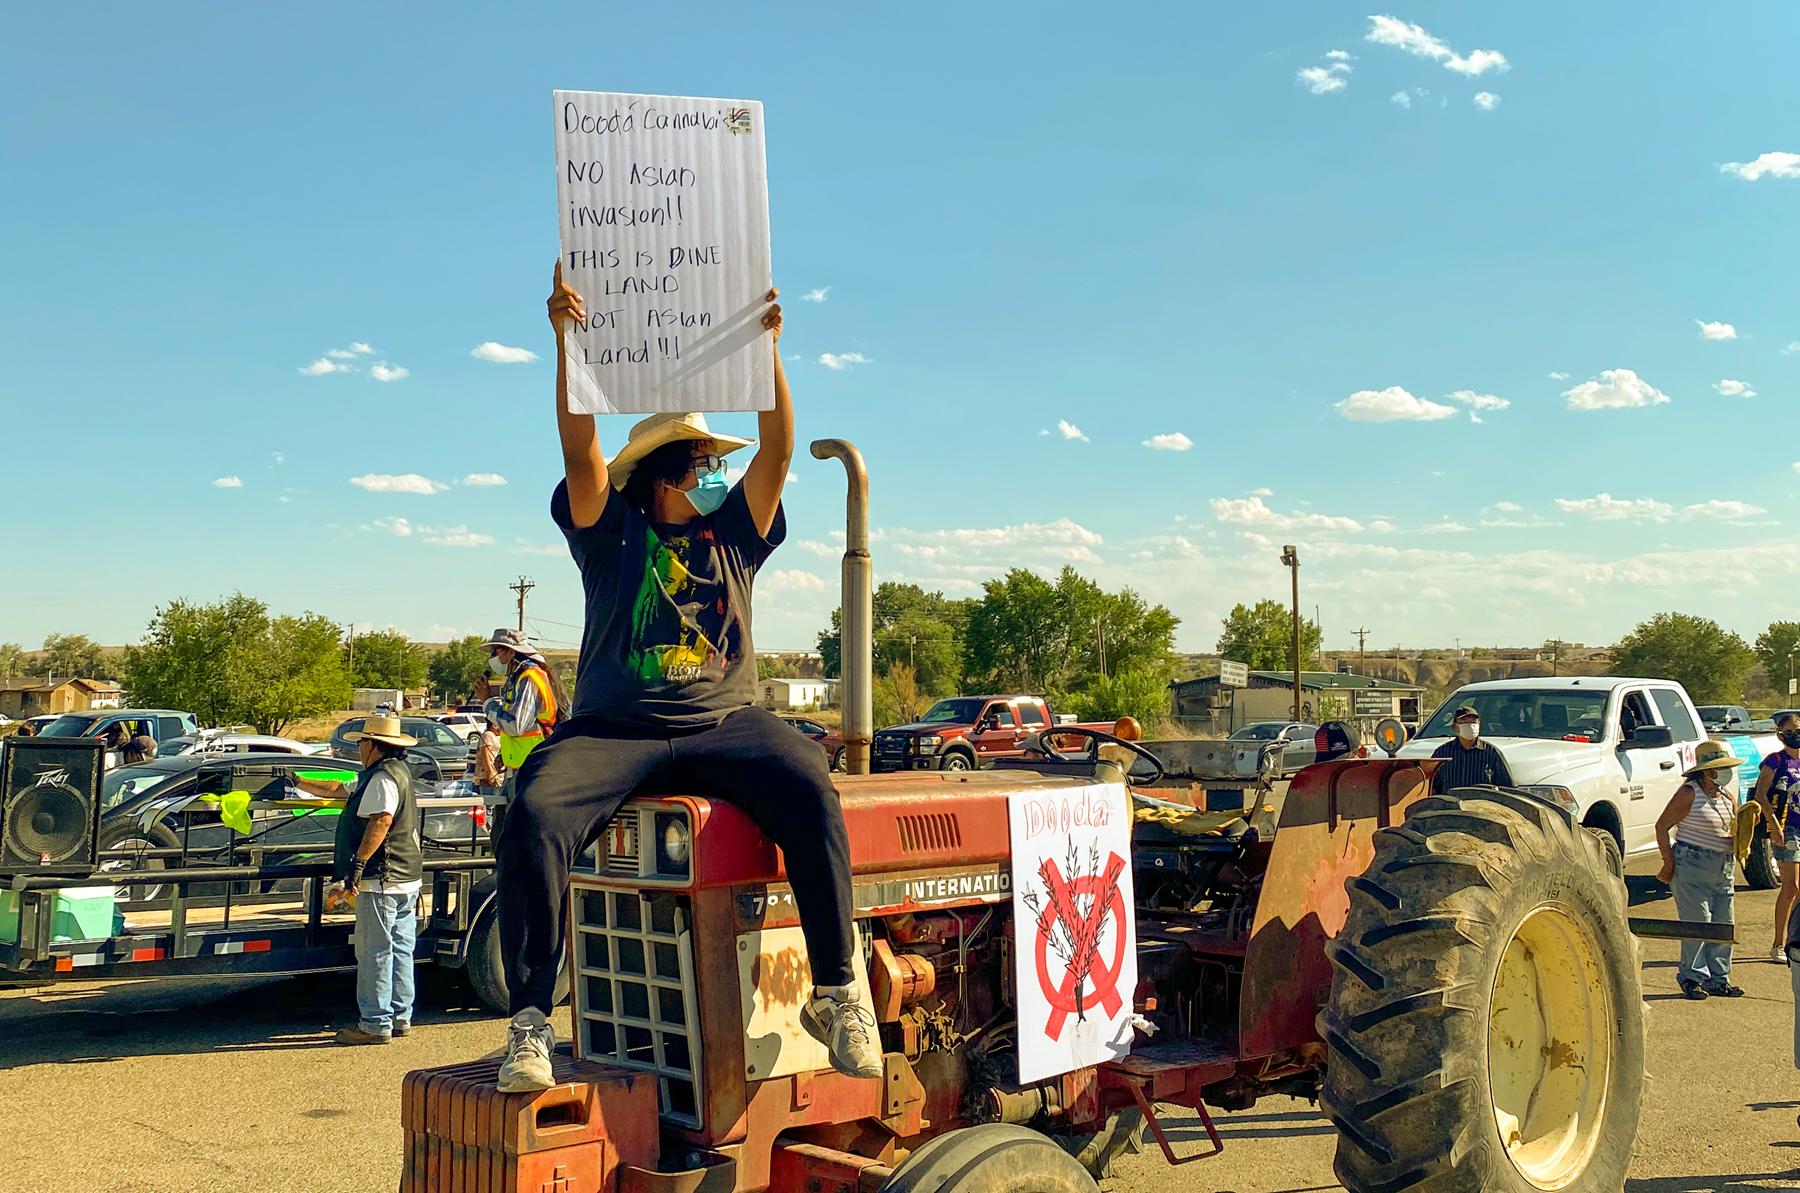 hemp protest sign